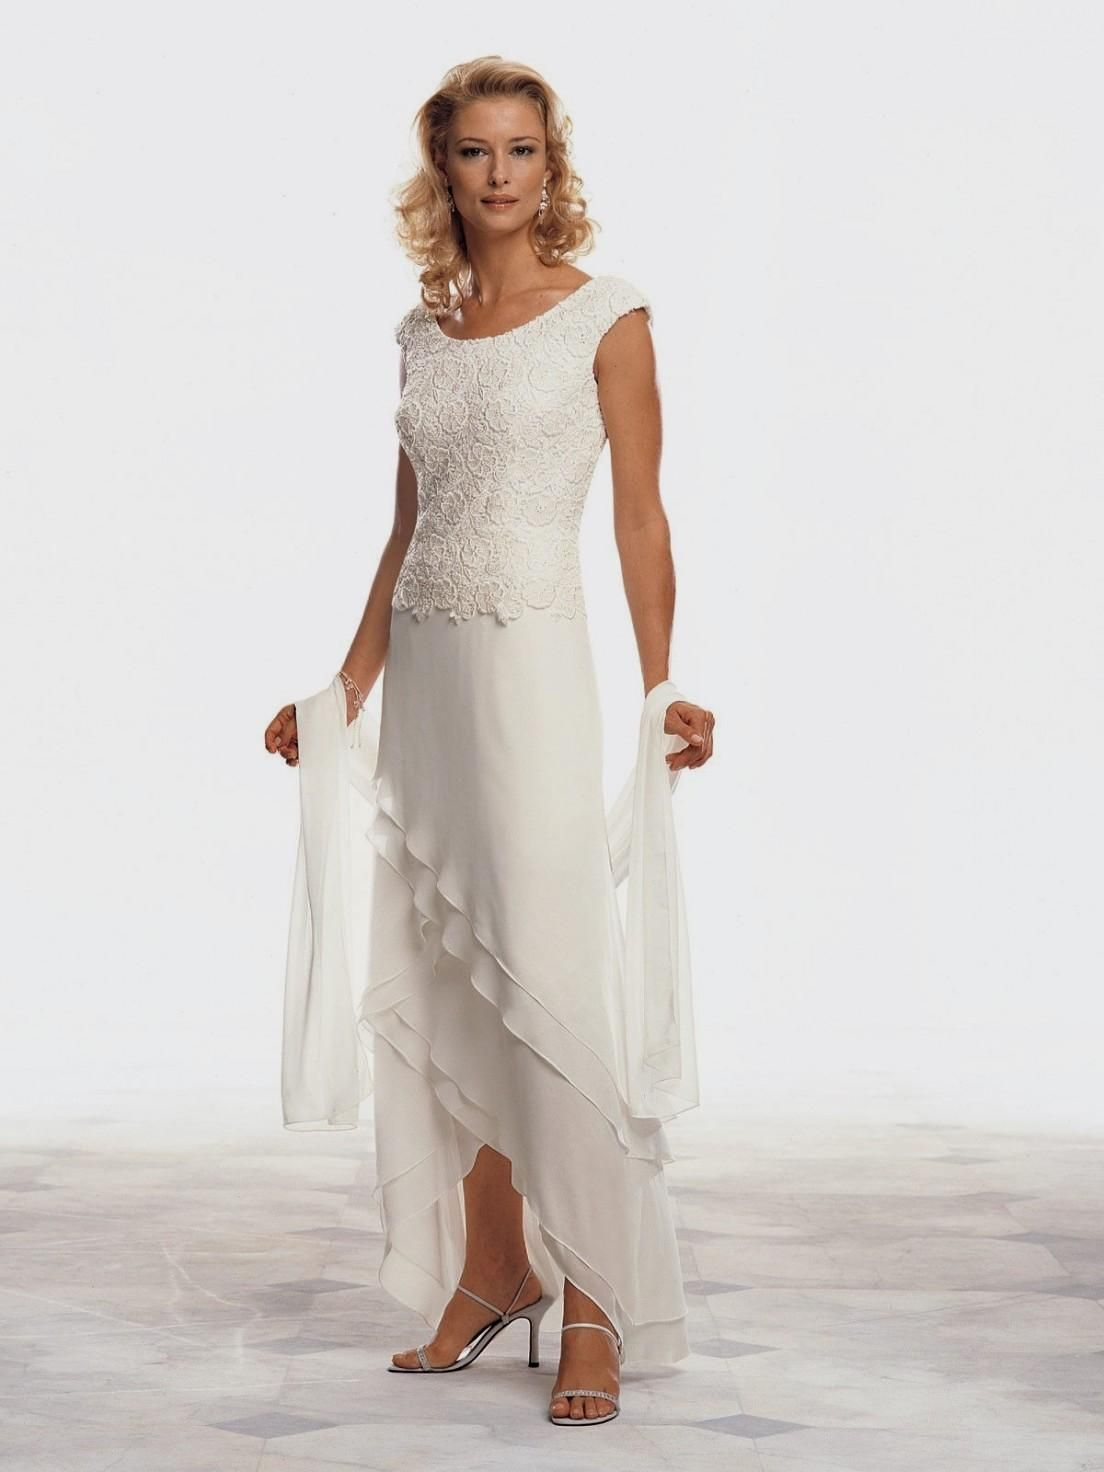 266a9c0b97 mother of the bride dresses beach wedding photo - 1 | MOB dresses ...